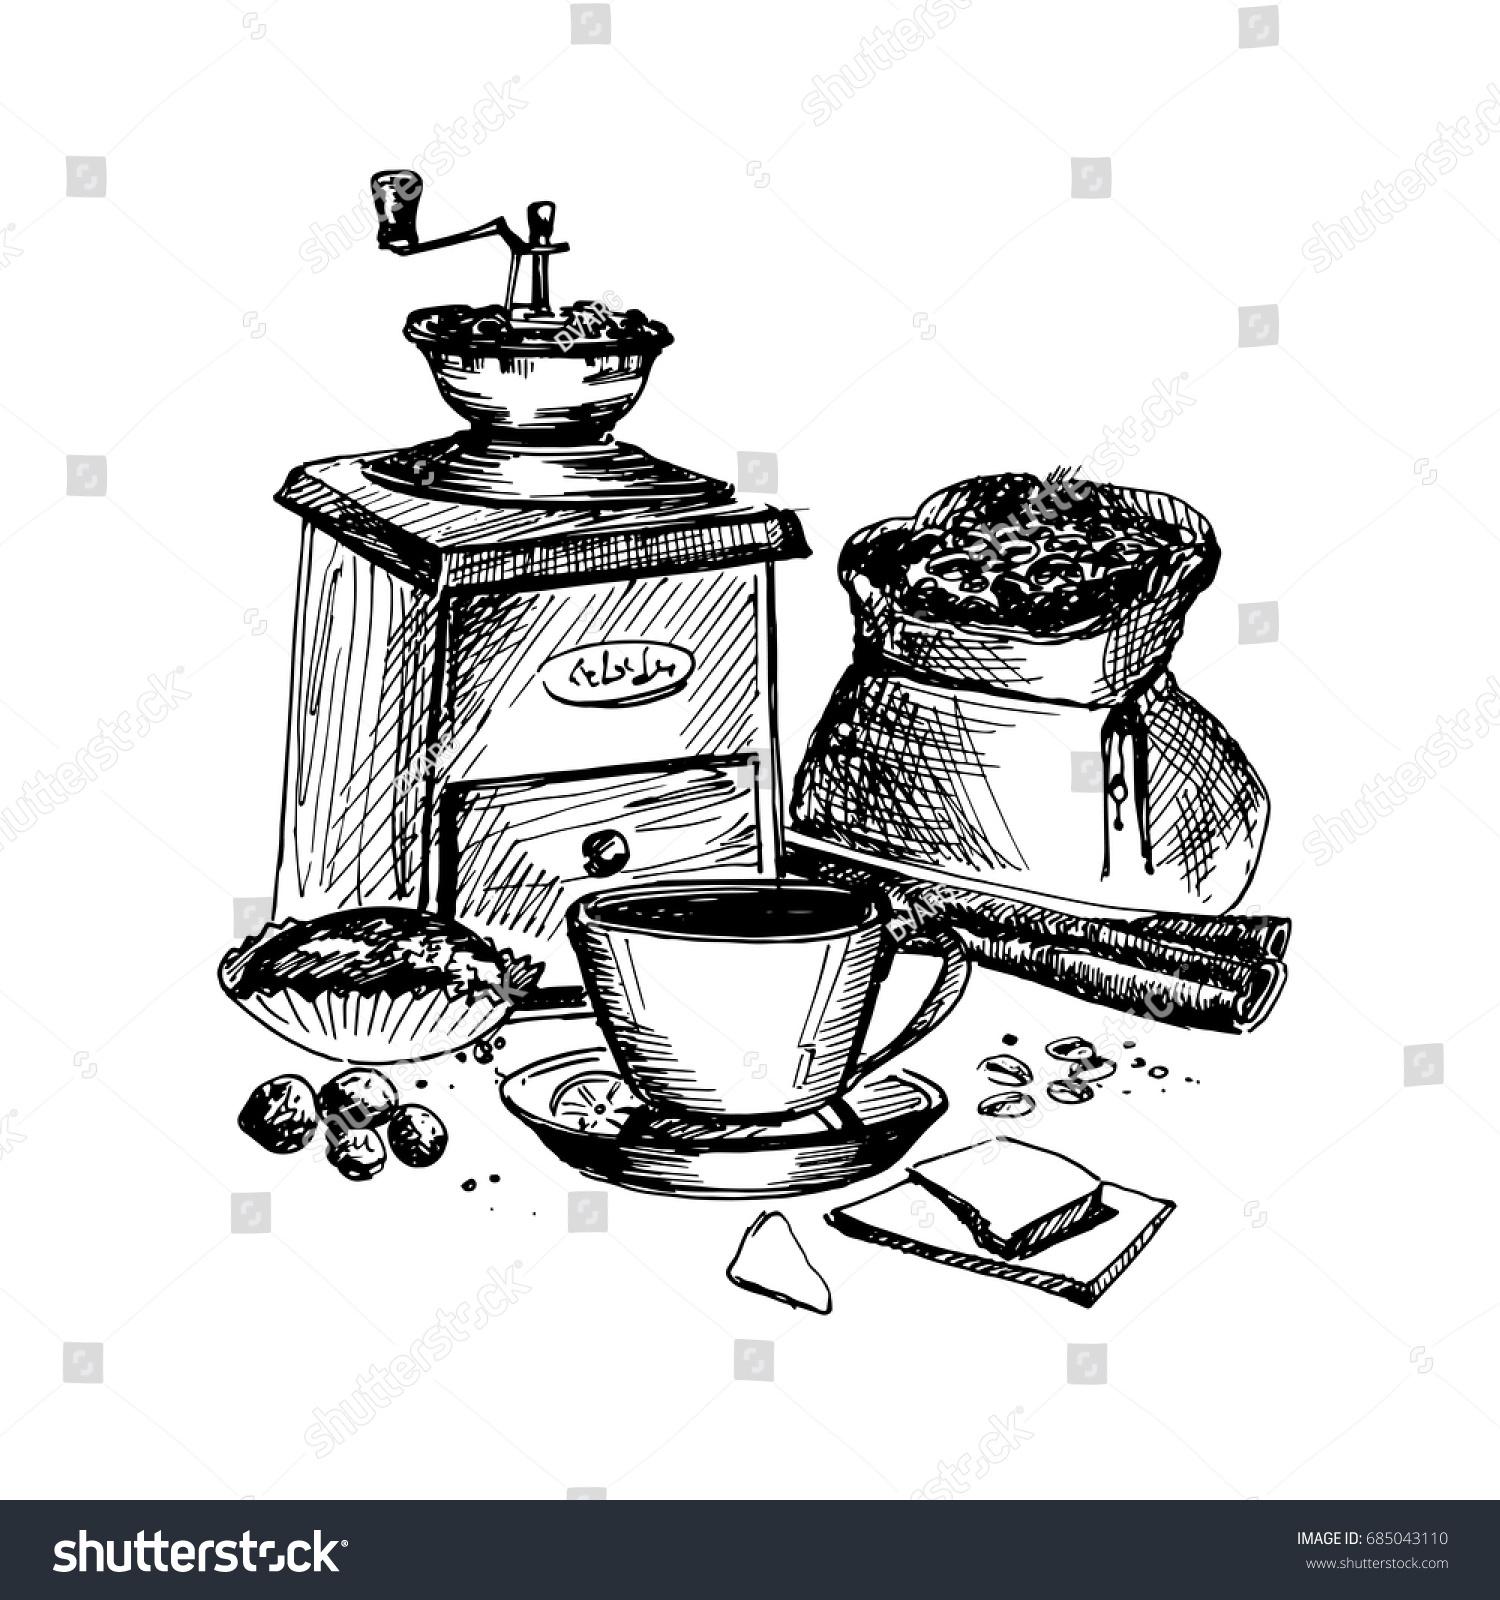 Hand Drawn Sketch Coffee Theme Vintage Stock Photo (Photo, Vector ...